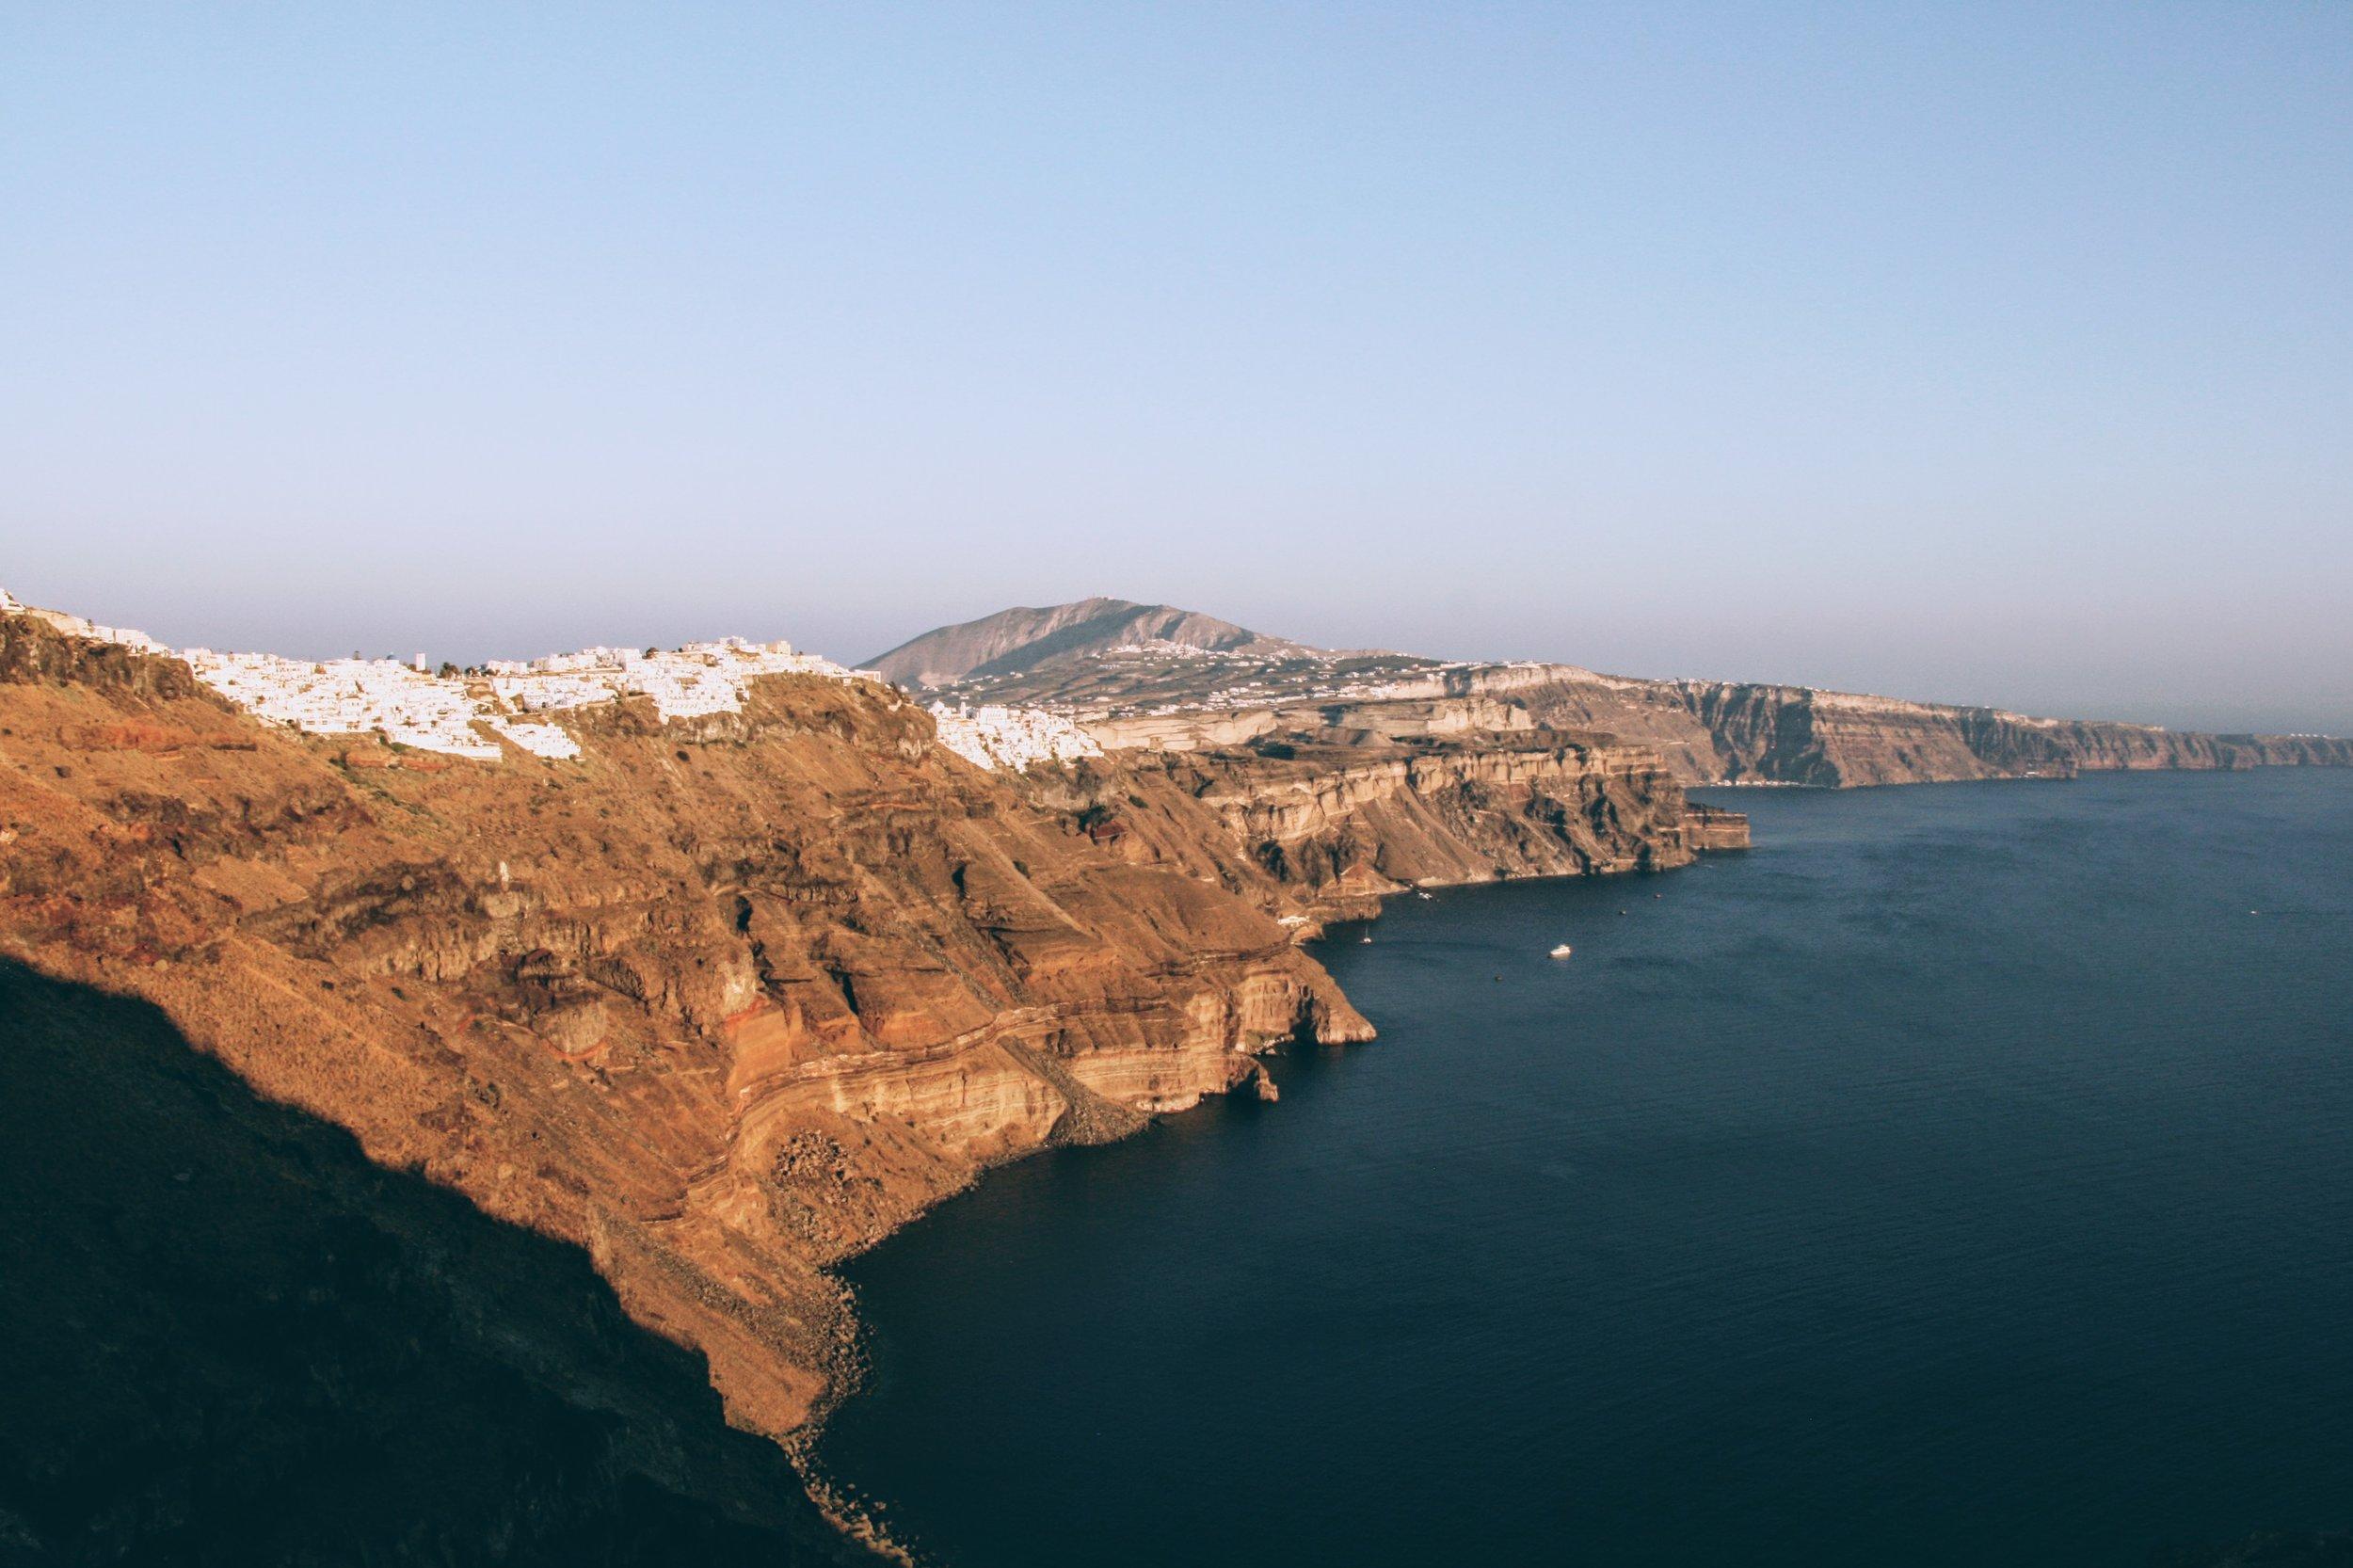 Hanging off the volcanic cliffs of Santorini